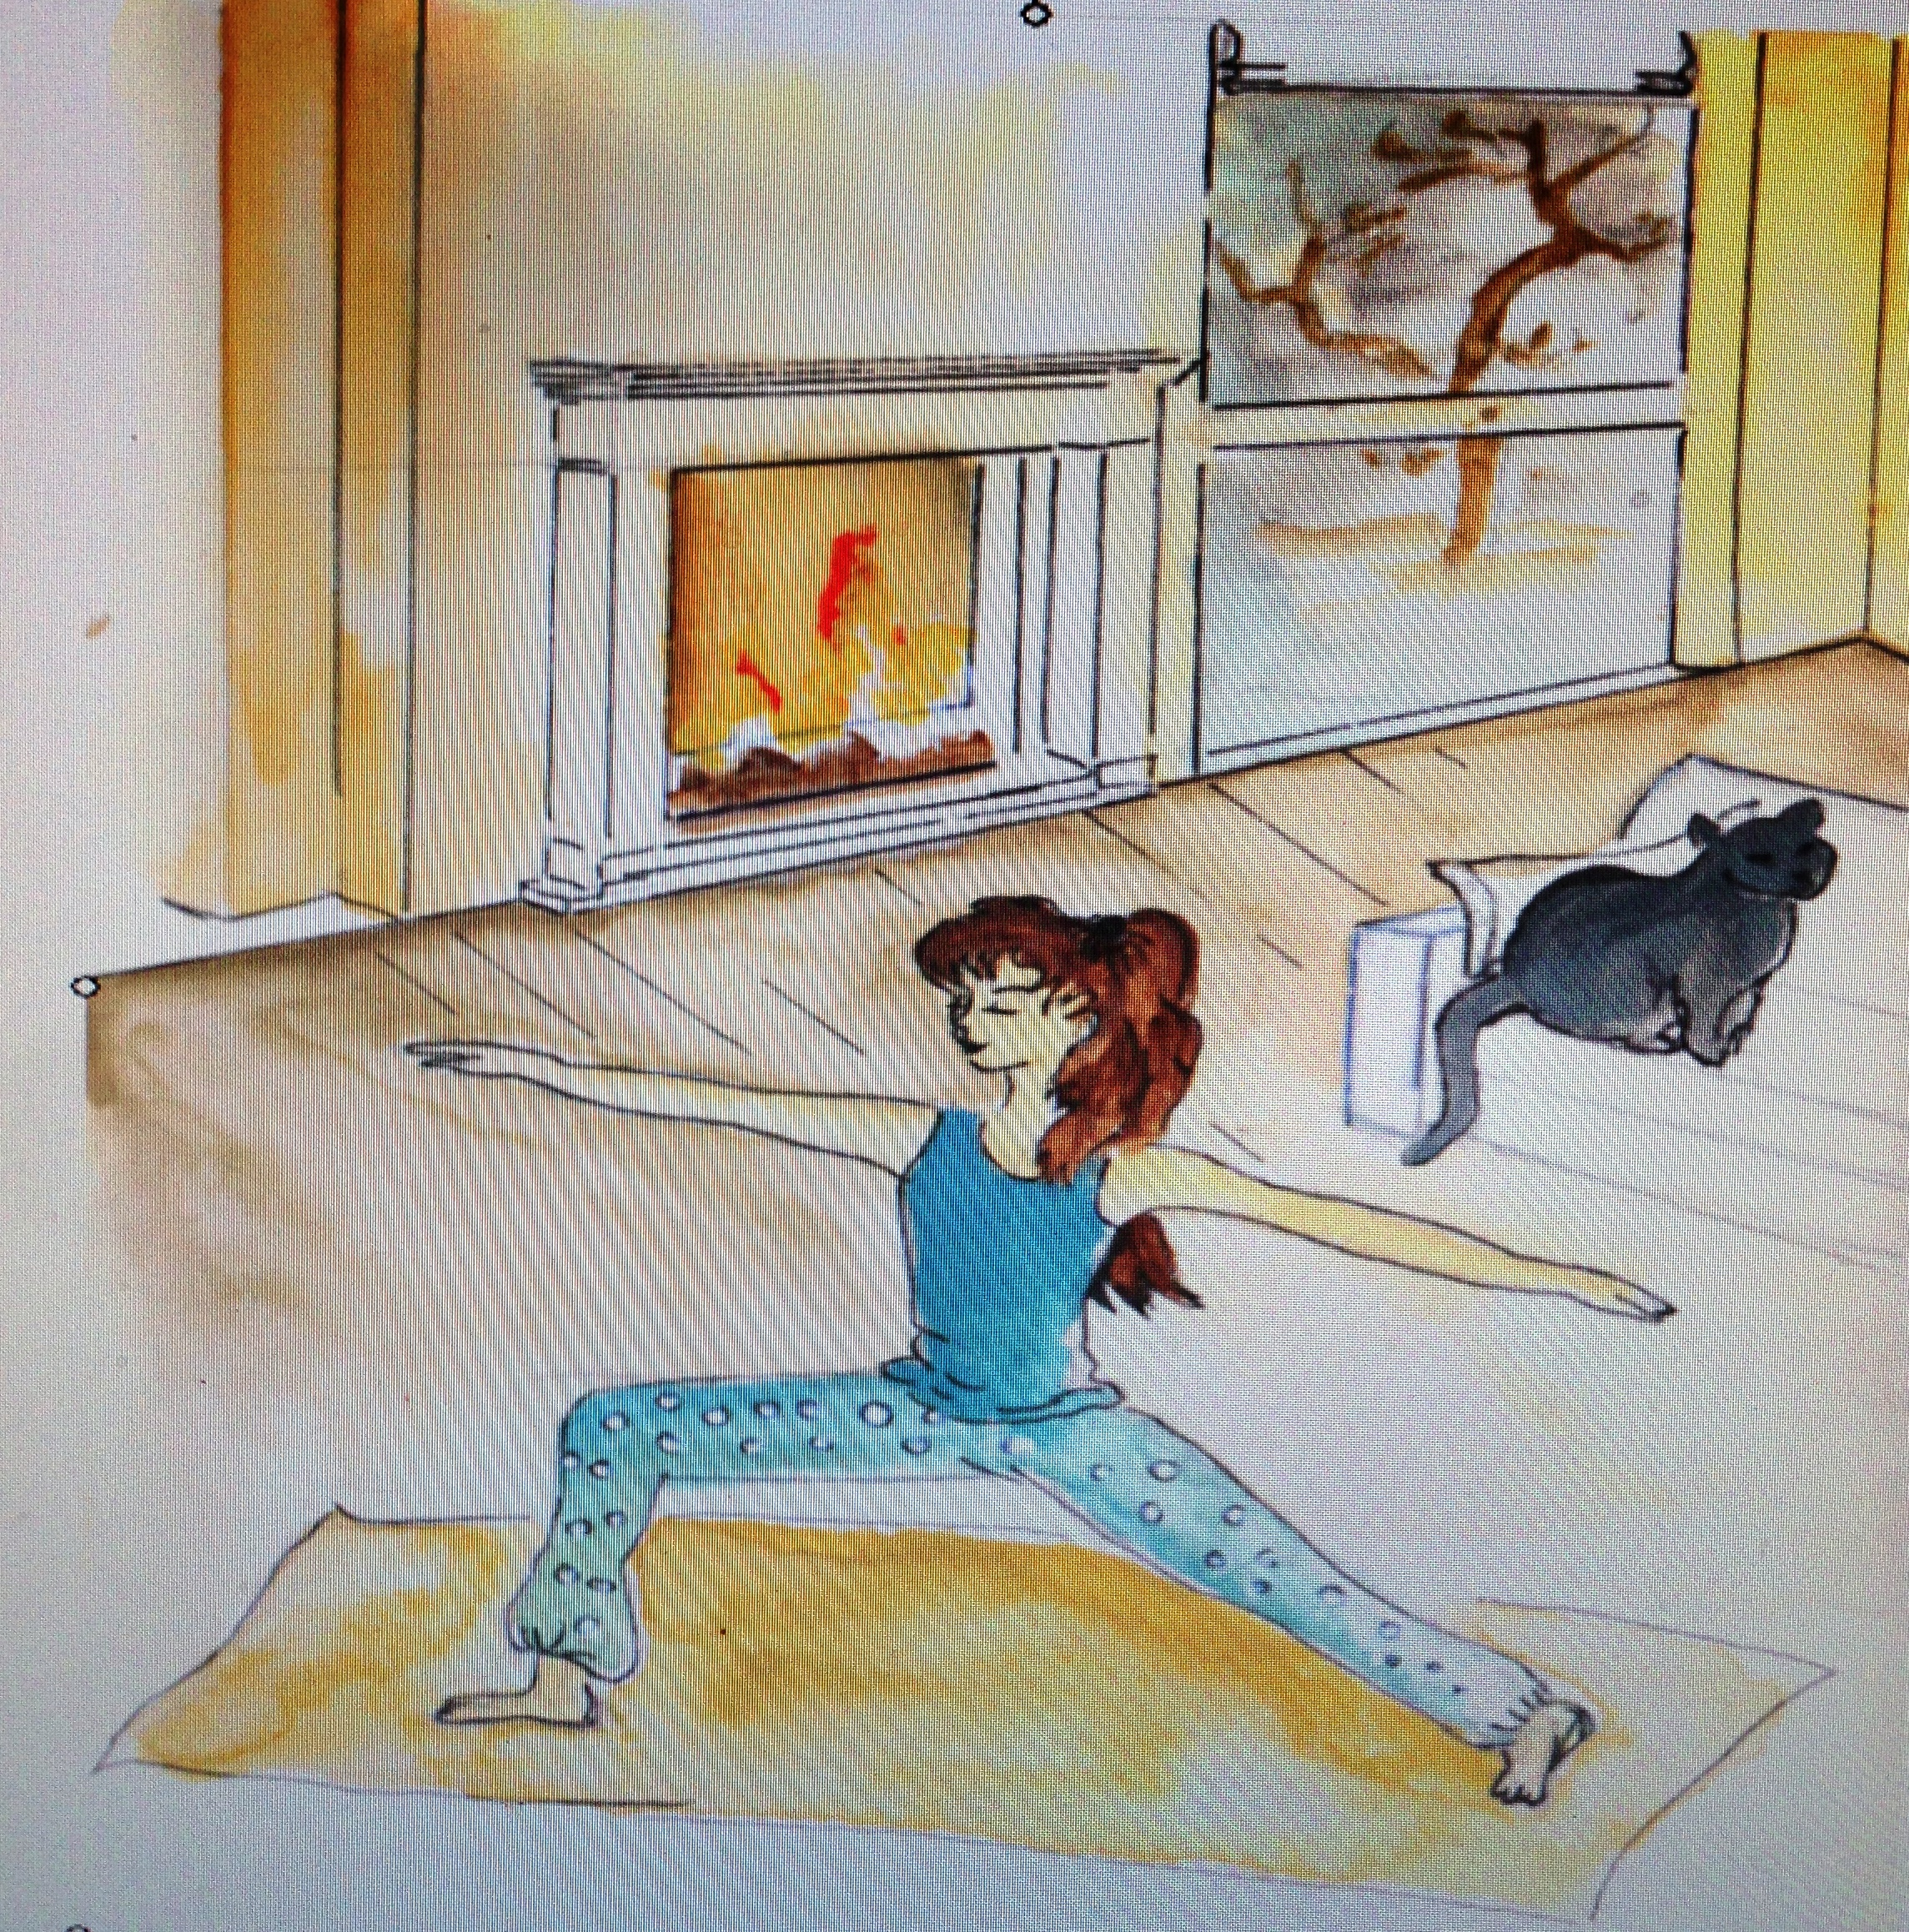 Yoga Präventionskurs §20 SGB ab 13.04.15